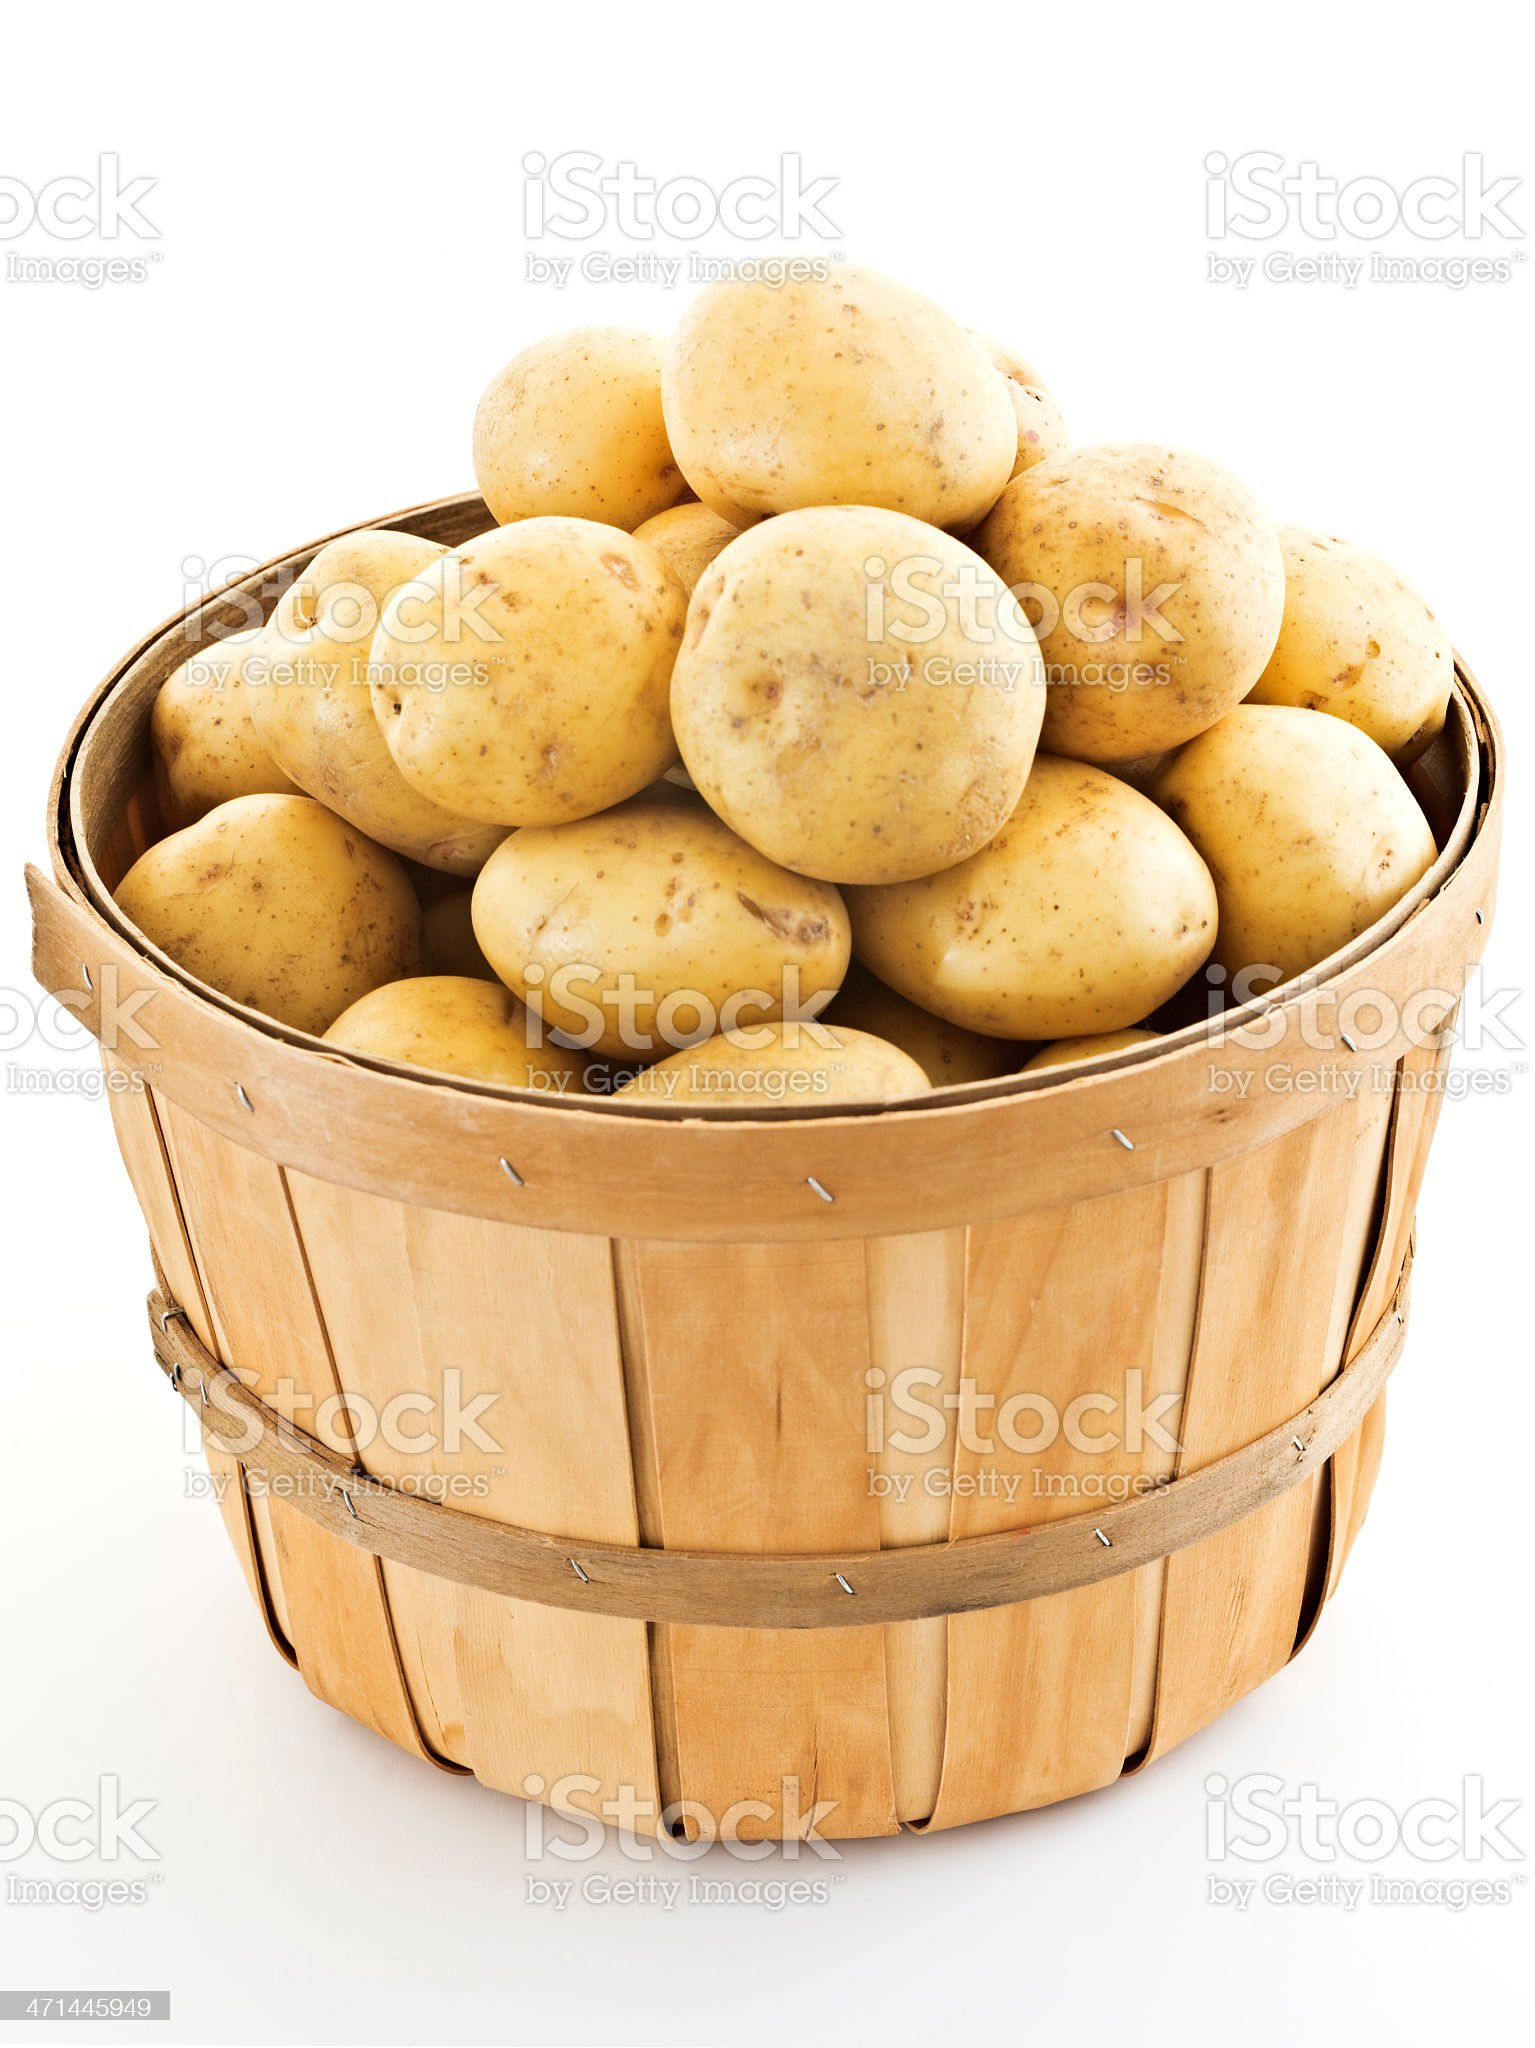 bushel of yukons royalty-free stock photo